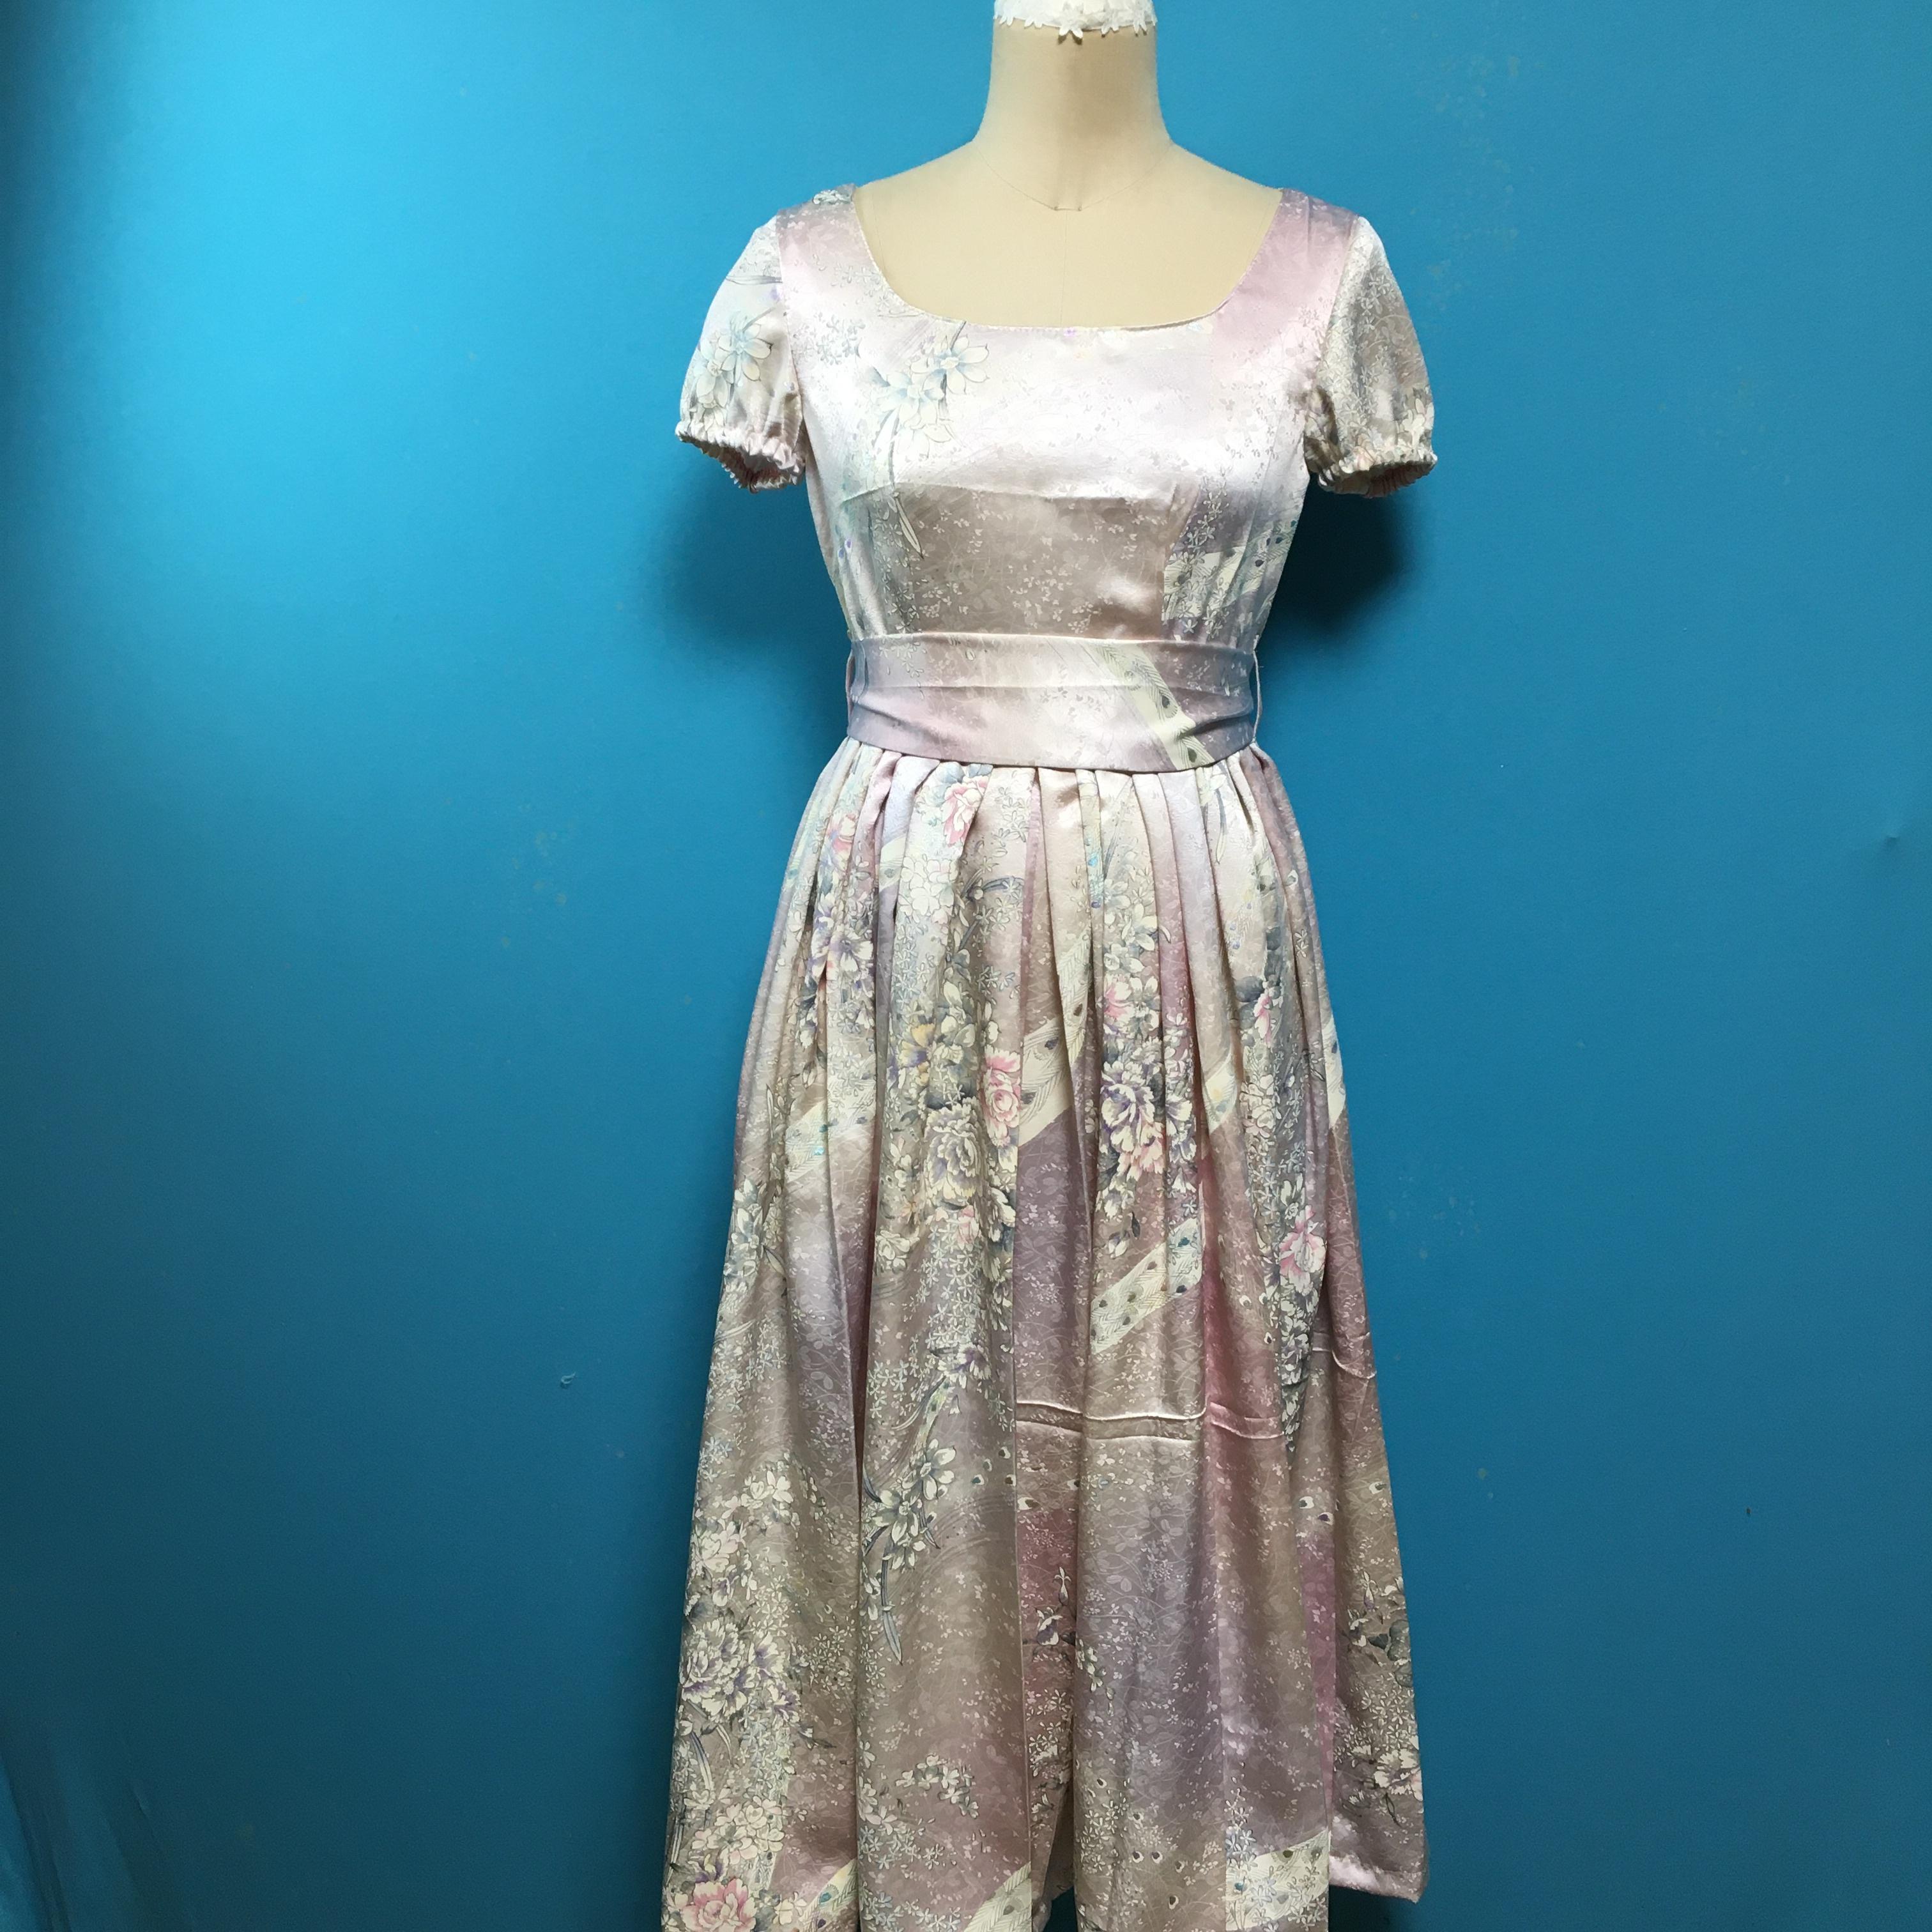 Vintage キラキラ桜色小紋のレトロワンピース